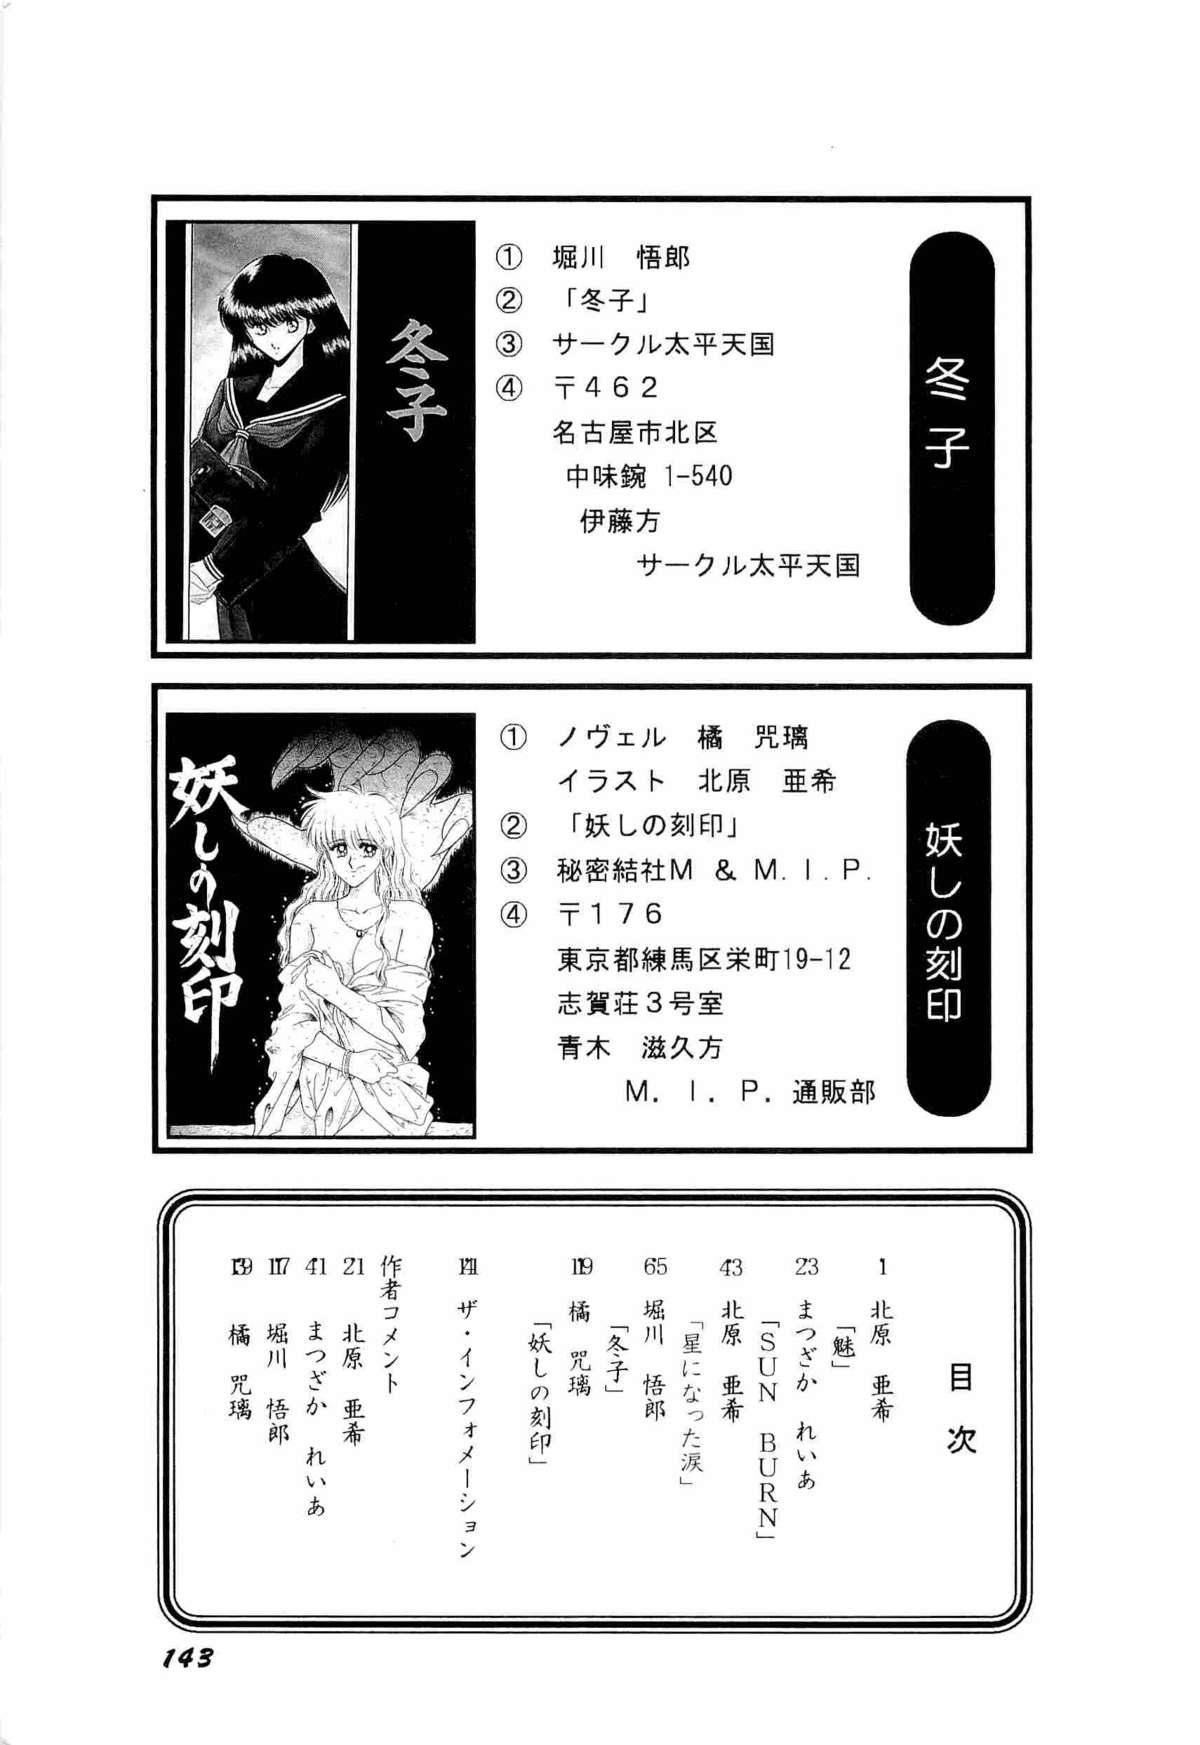 Bisyoujo Anthology '93 jyoukan 145